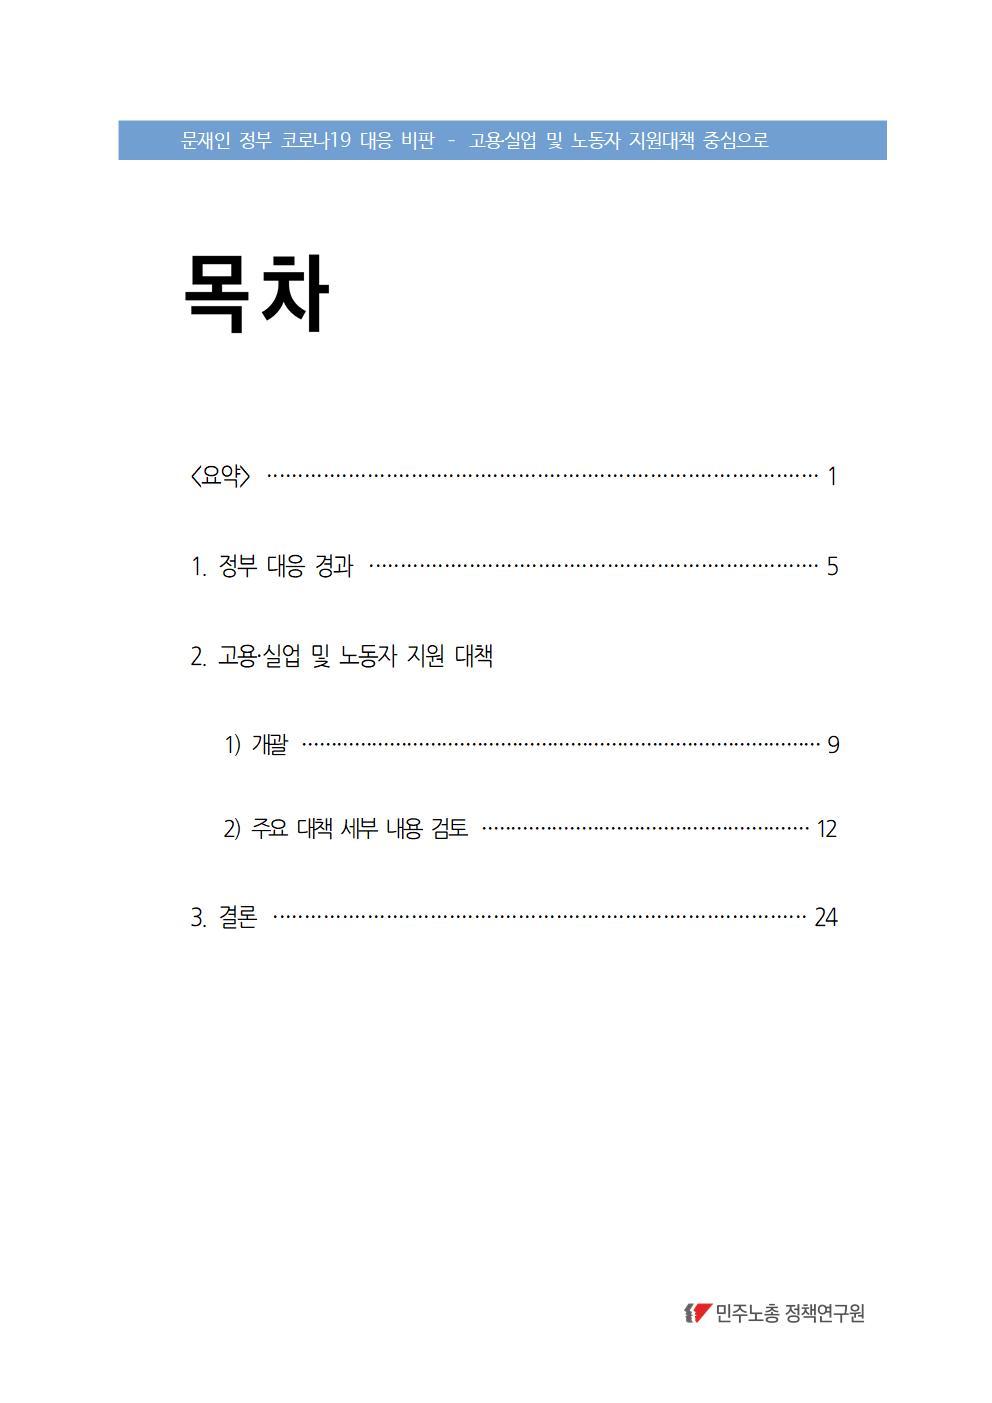 200413_KCTU_LI_코로나정부대응비판_이슈페이퍼_최종(final_final)_표지002.jpg